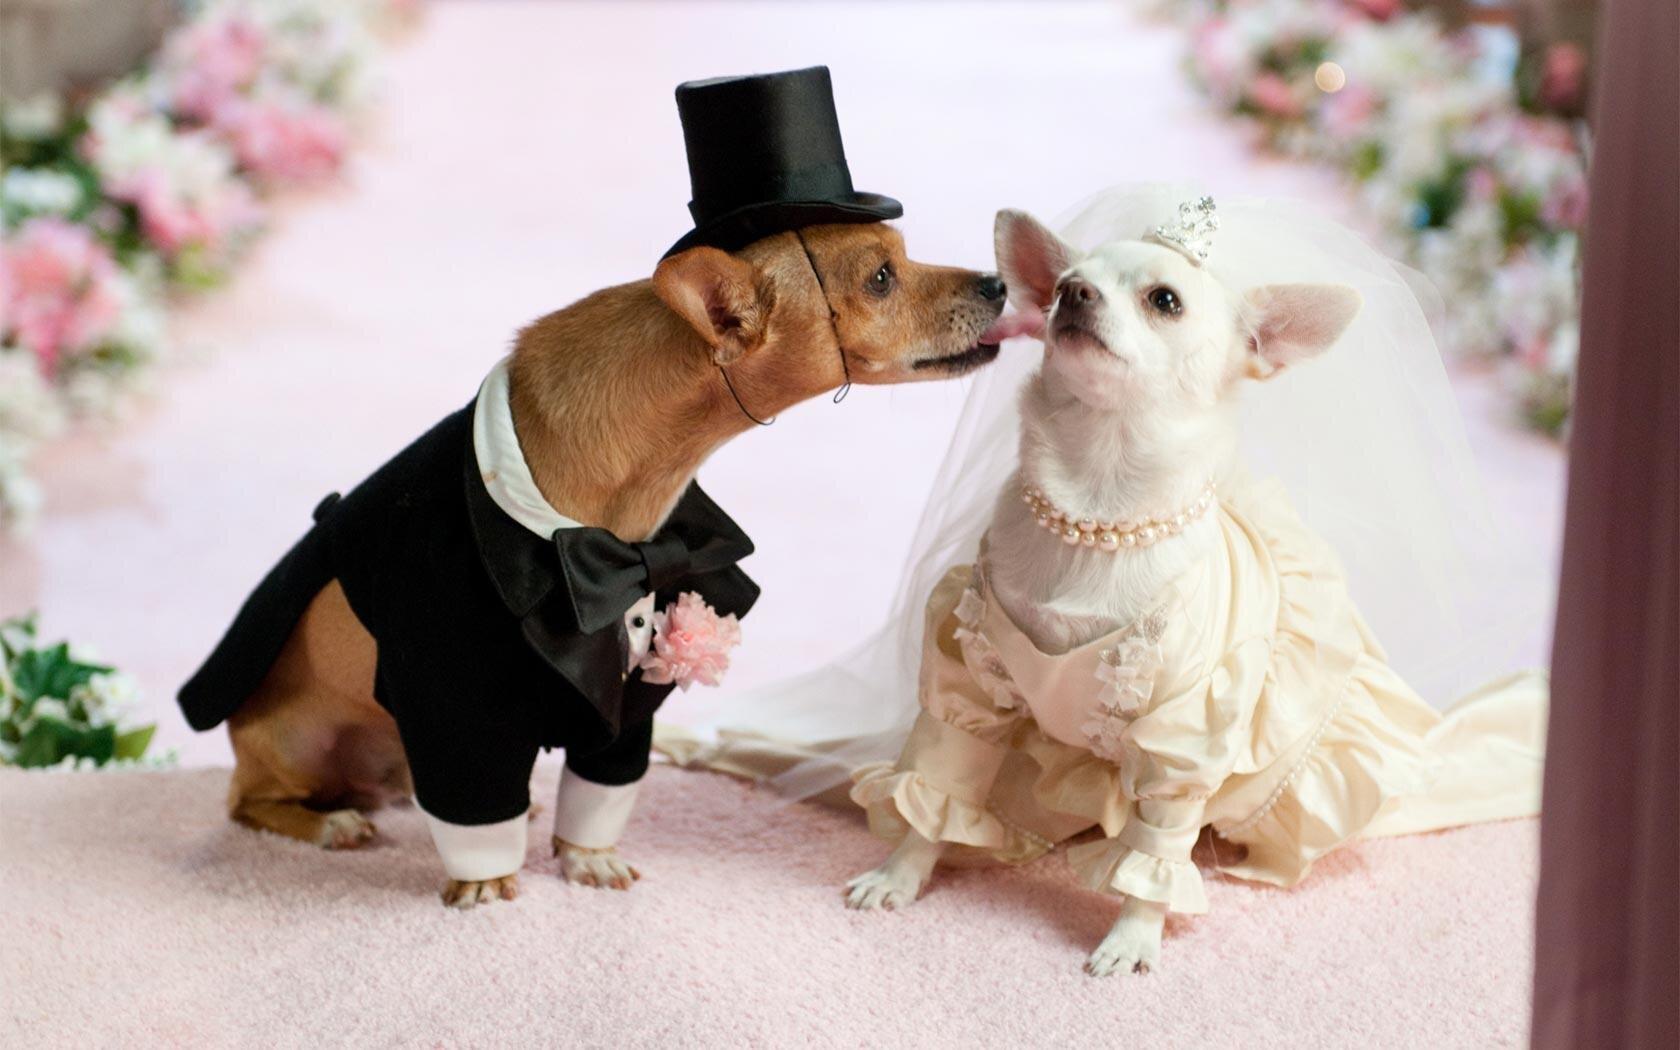 You May Kiss The... Bride?